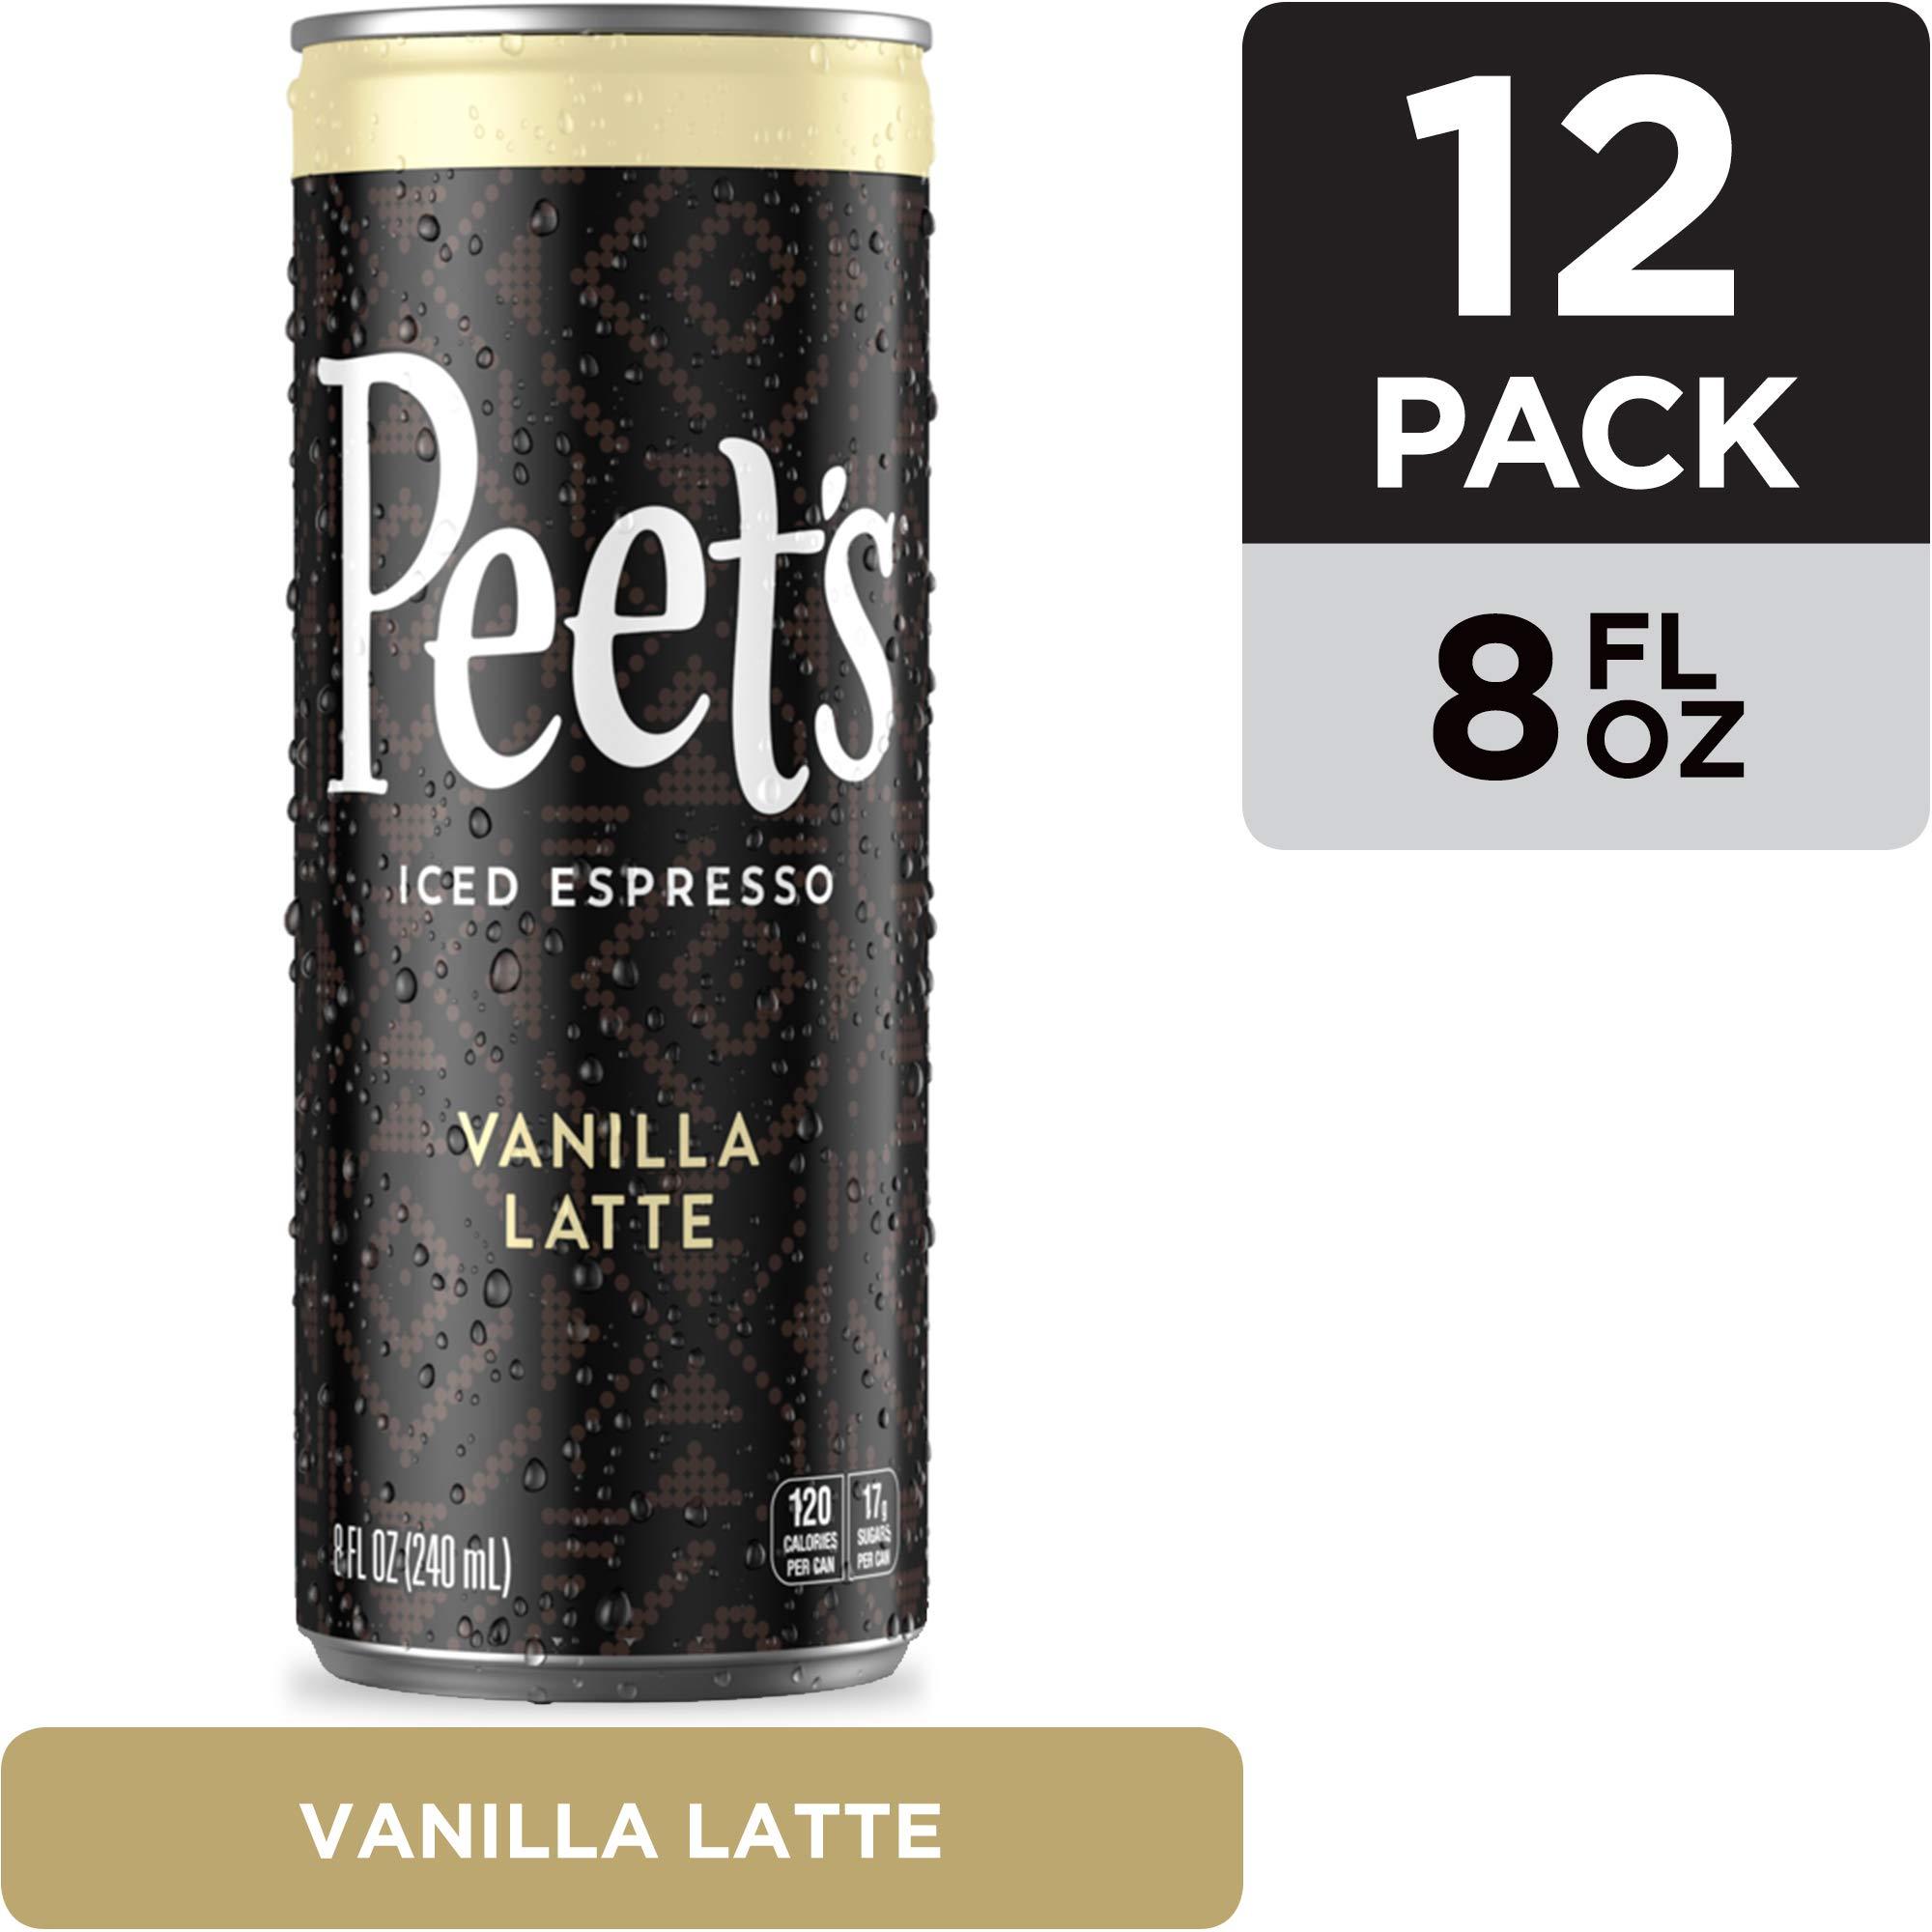 Peet's Iced Espresso Vanilla Latte 8 oz, Single Origin Colombian Espresso + Milk and Cane Sugar, 120 calories, 12 pack by Peet's Coffee